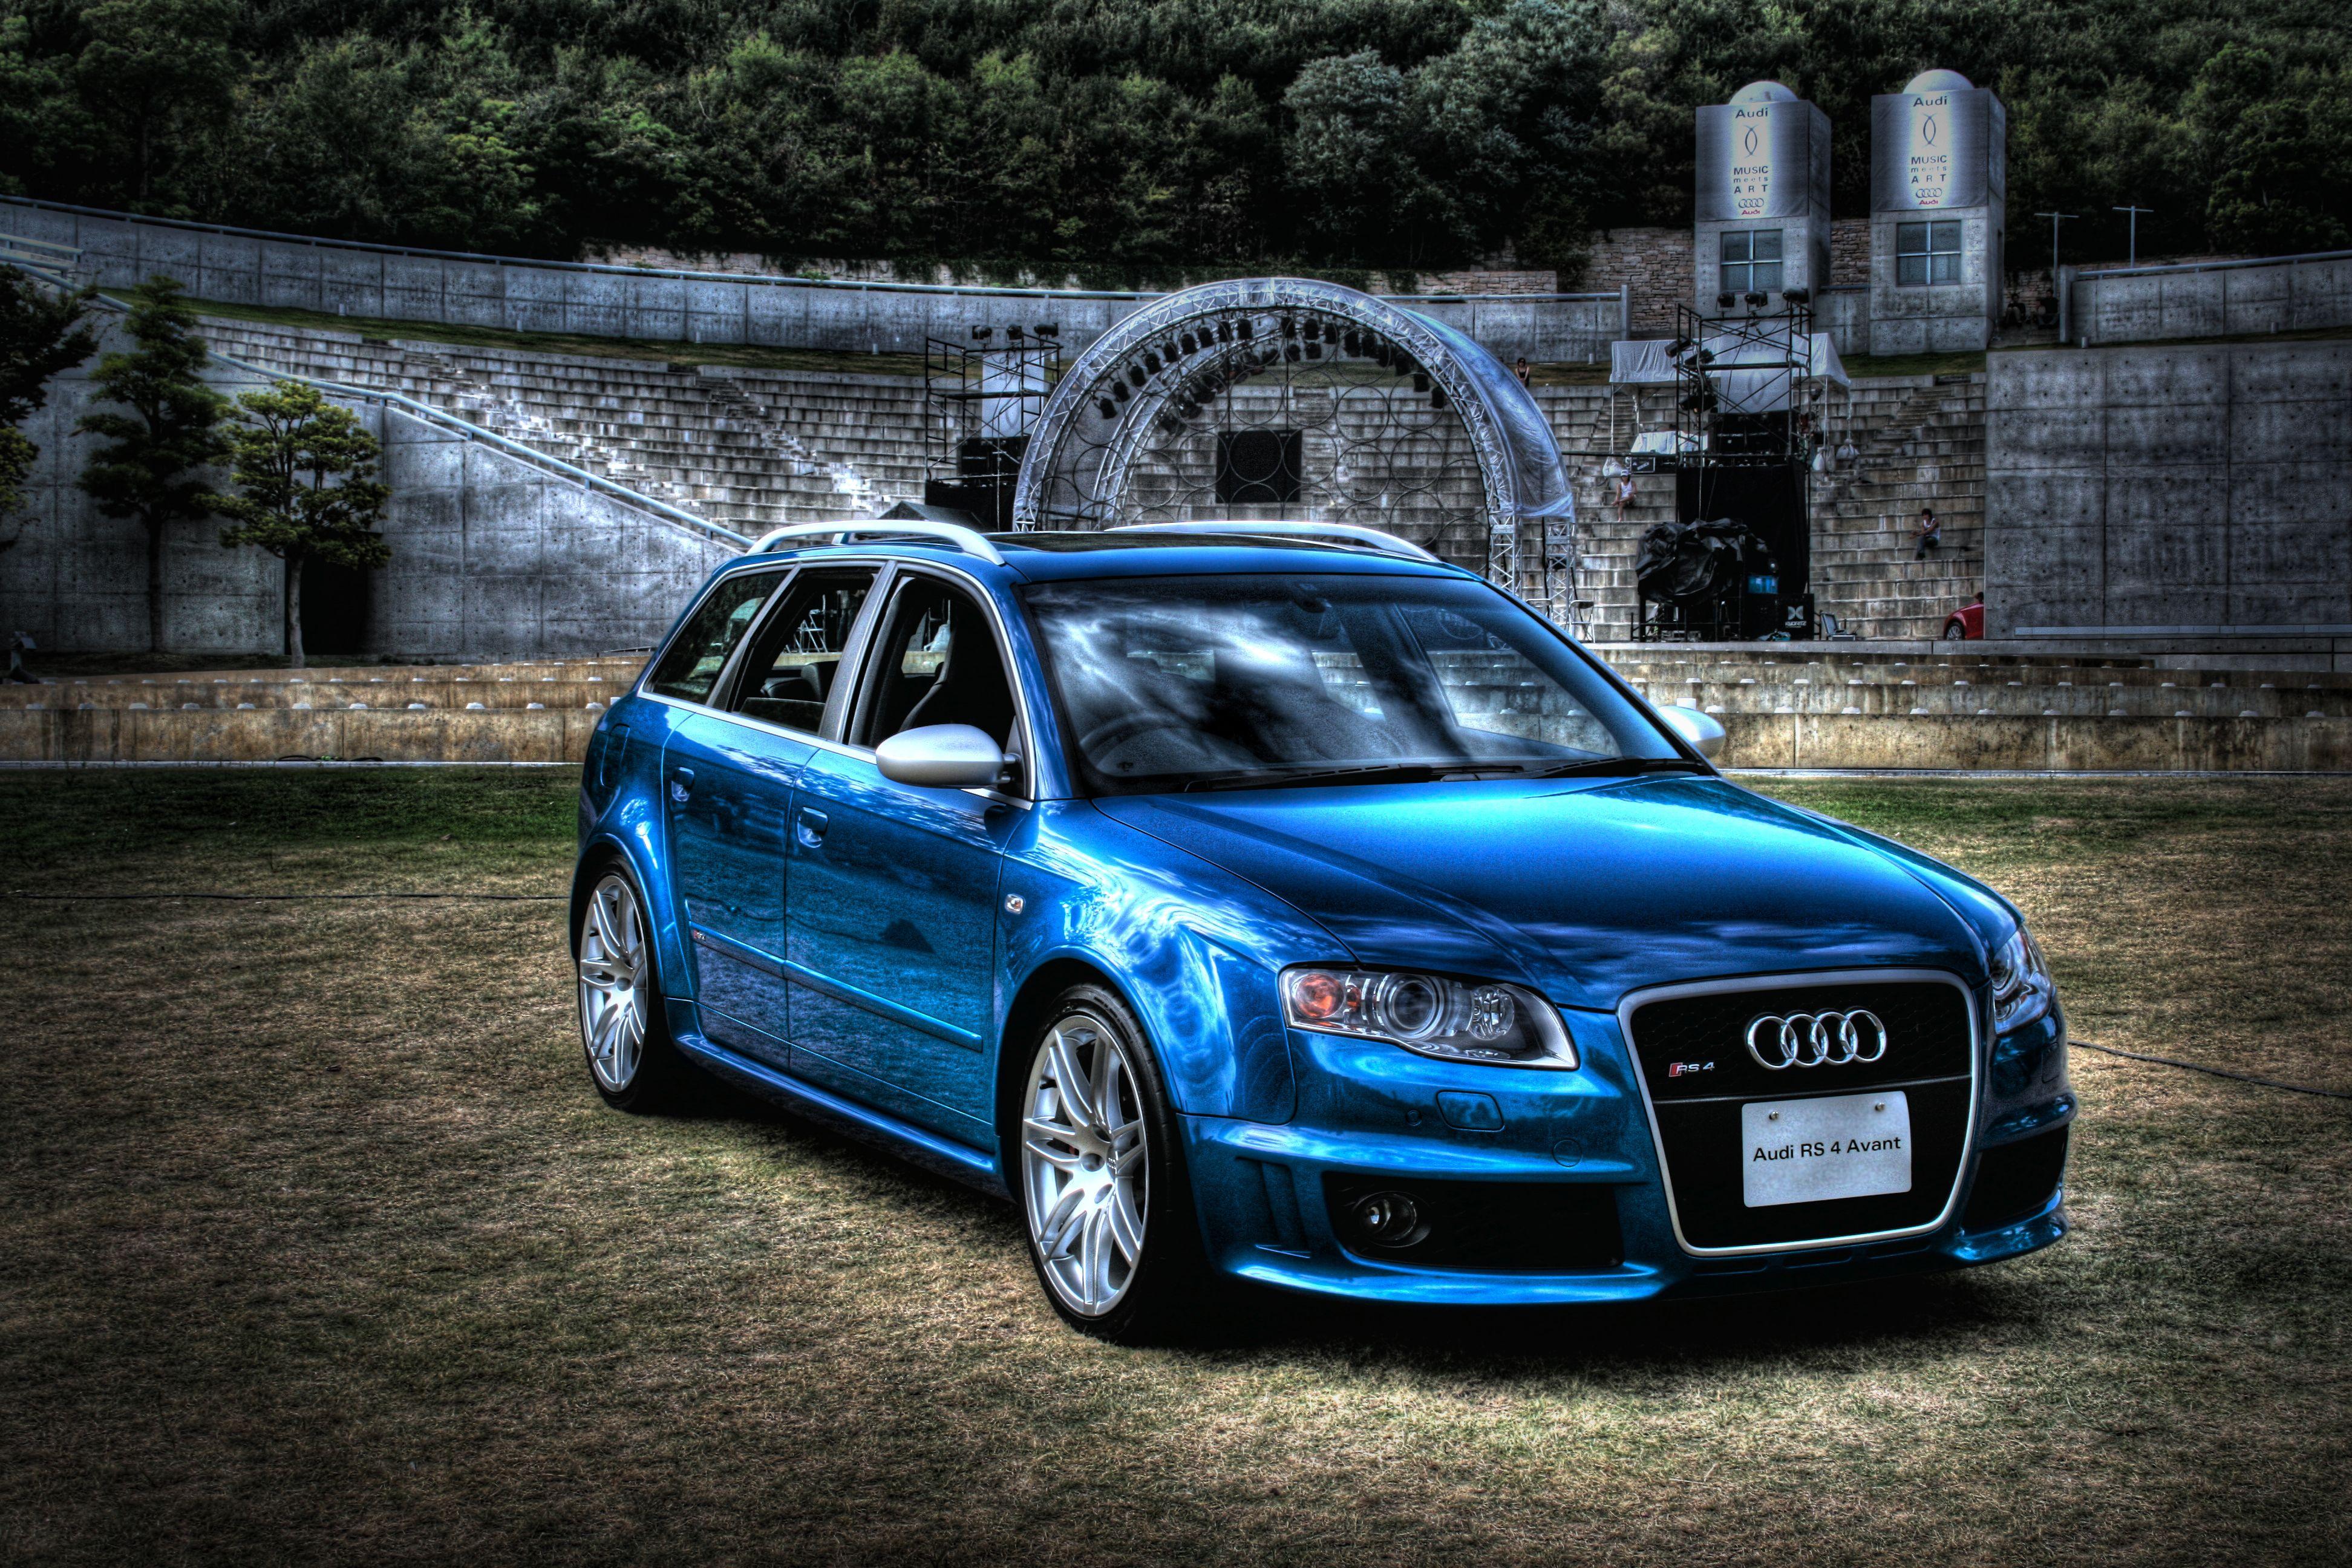 B7 Rs4 Avant Audi Audi Wallpaper Audi Rs4